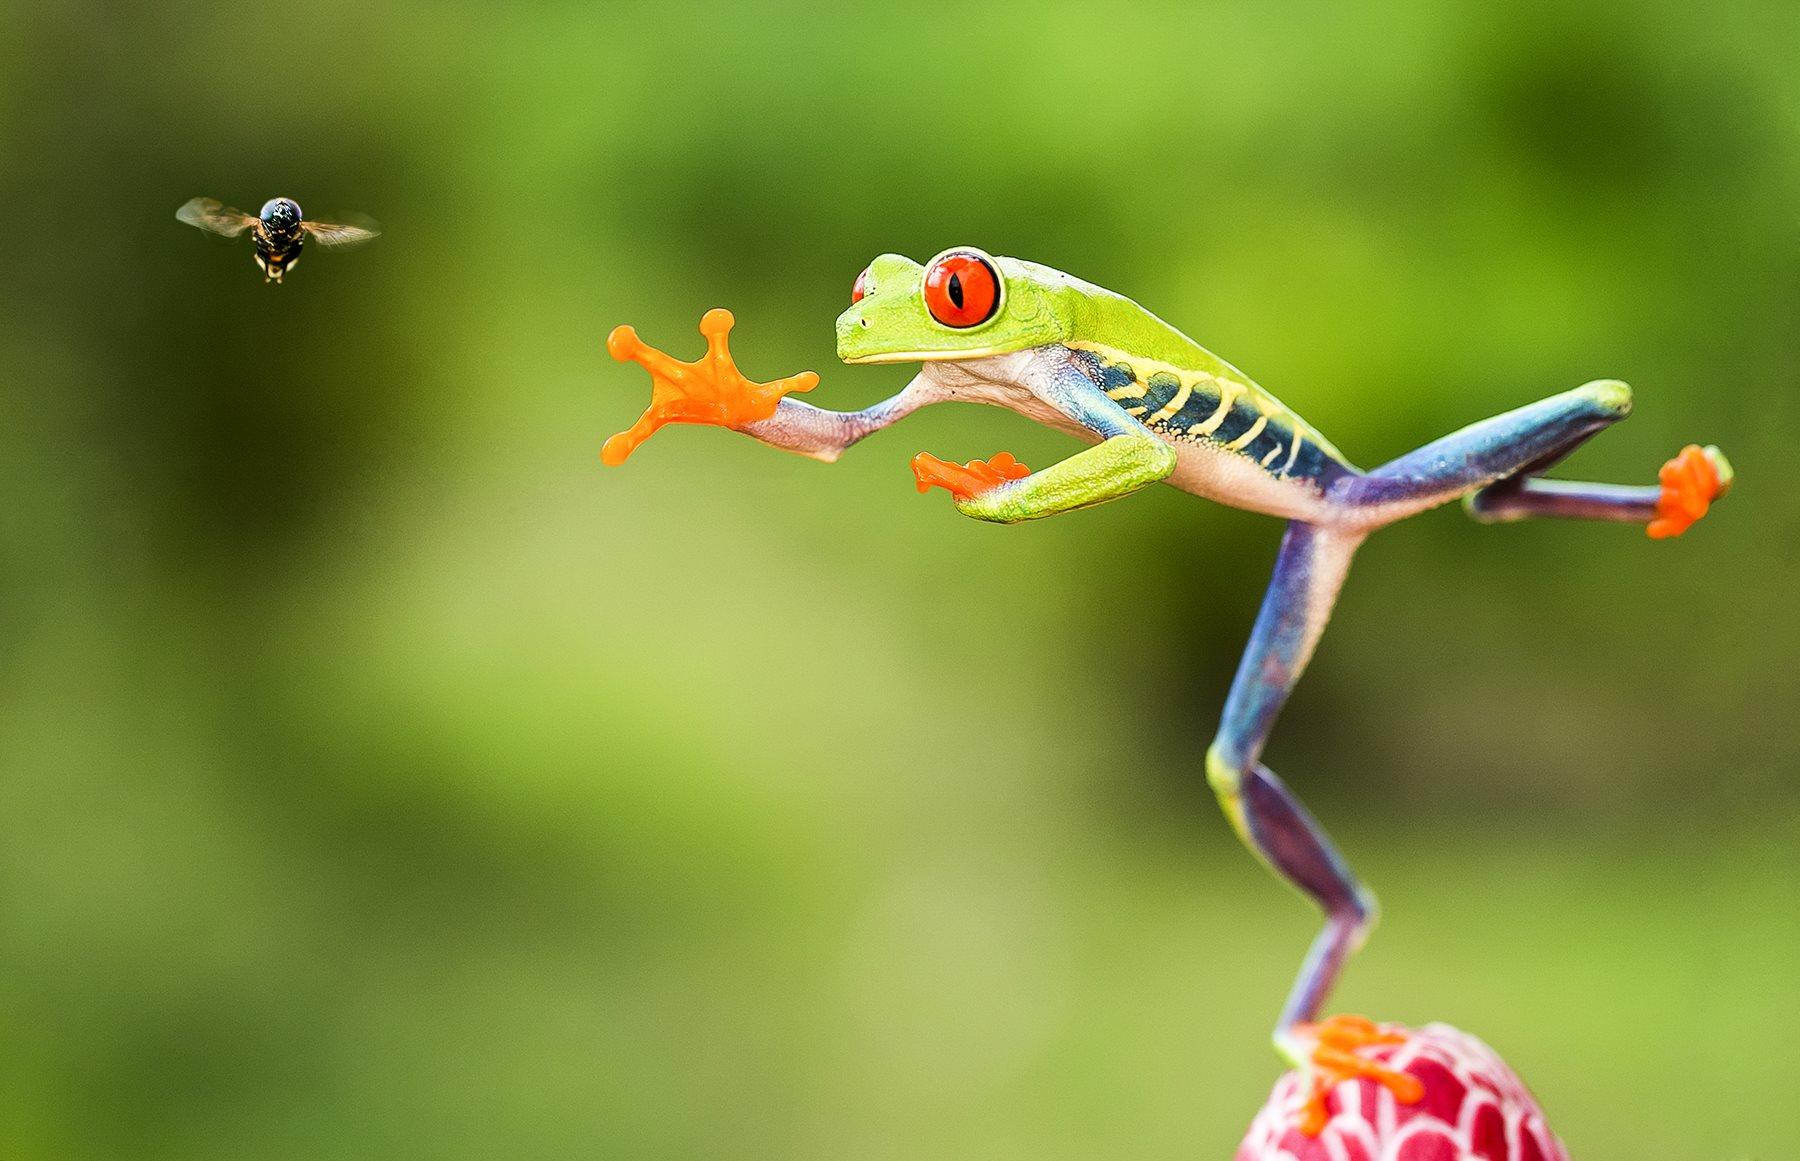 58 fotos de anfibios